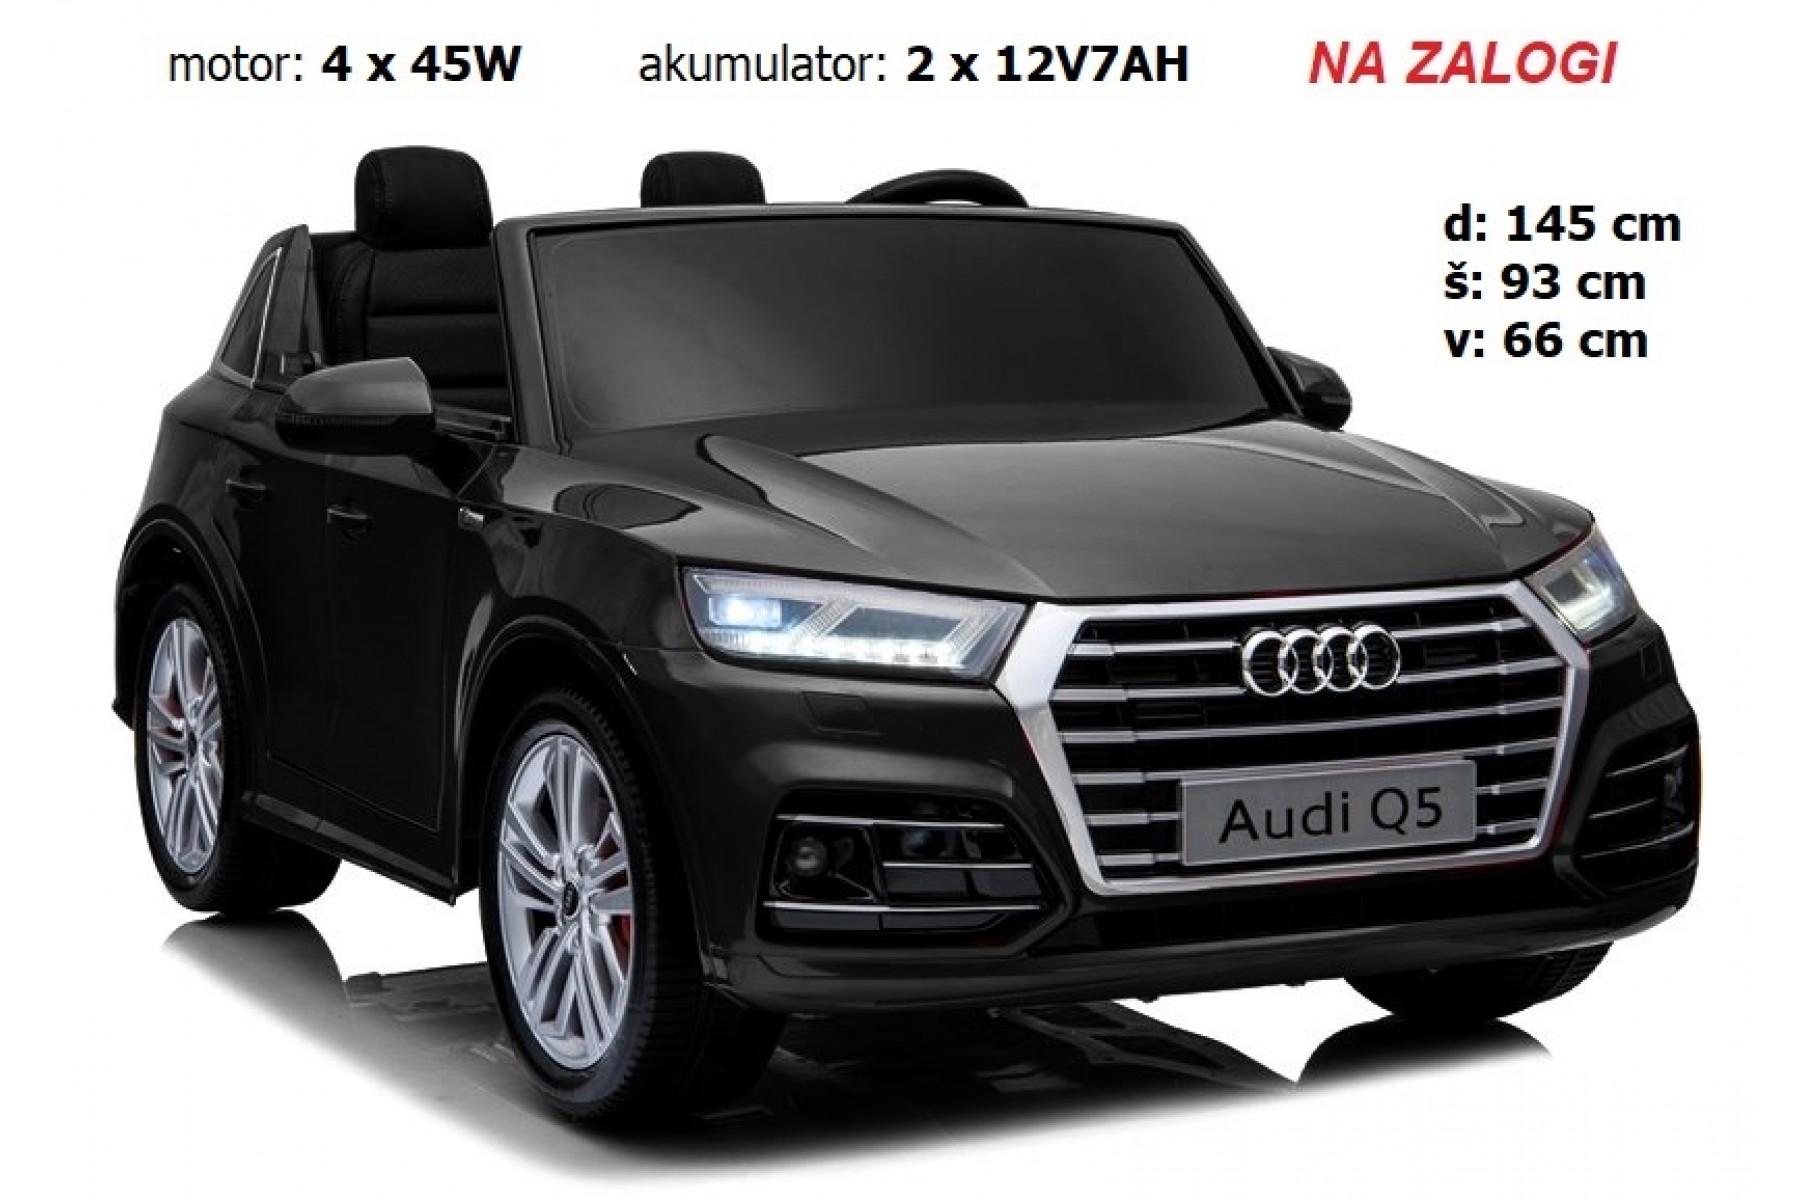 AUDI Q5 Quattro DVOSED (črn)